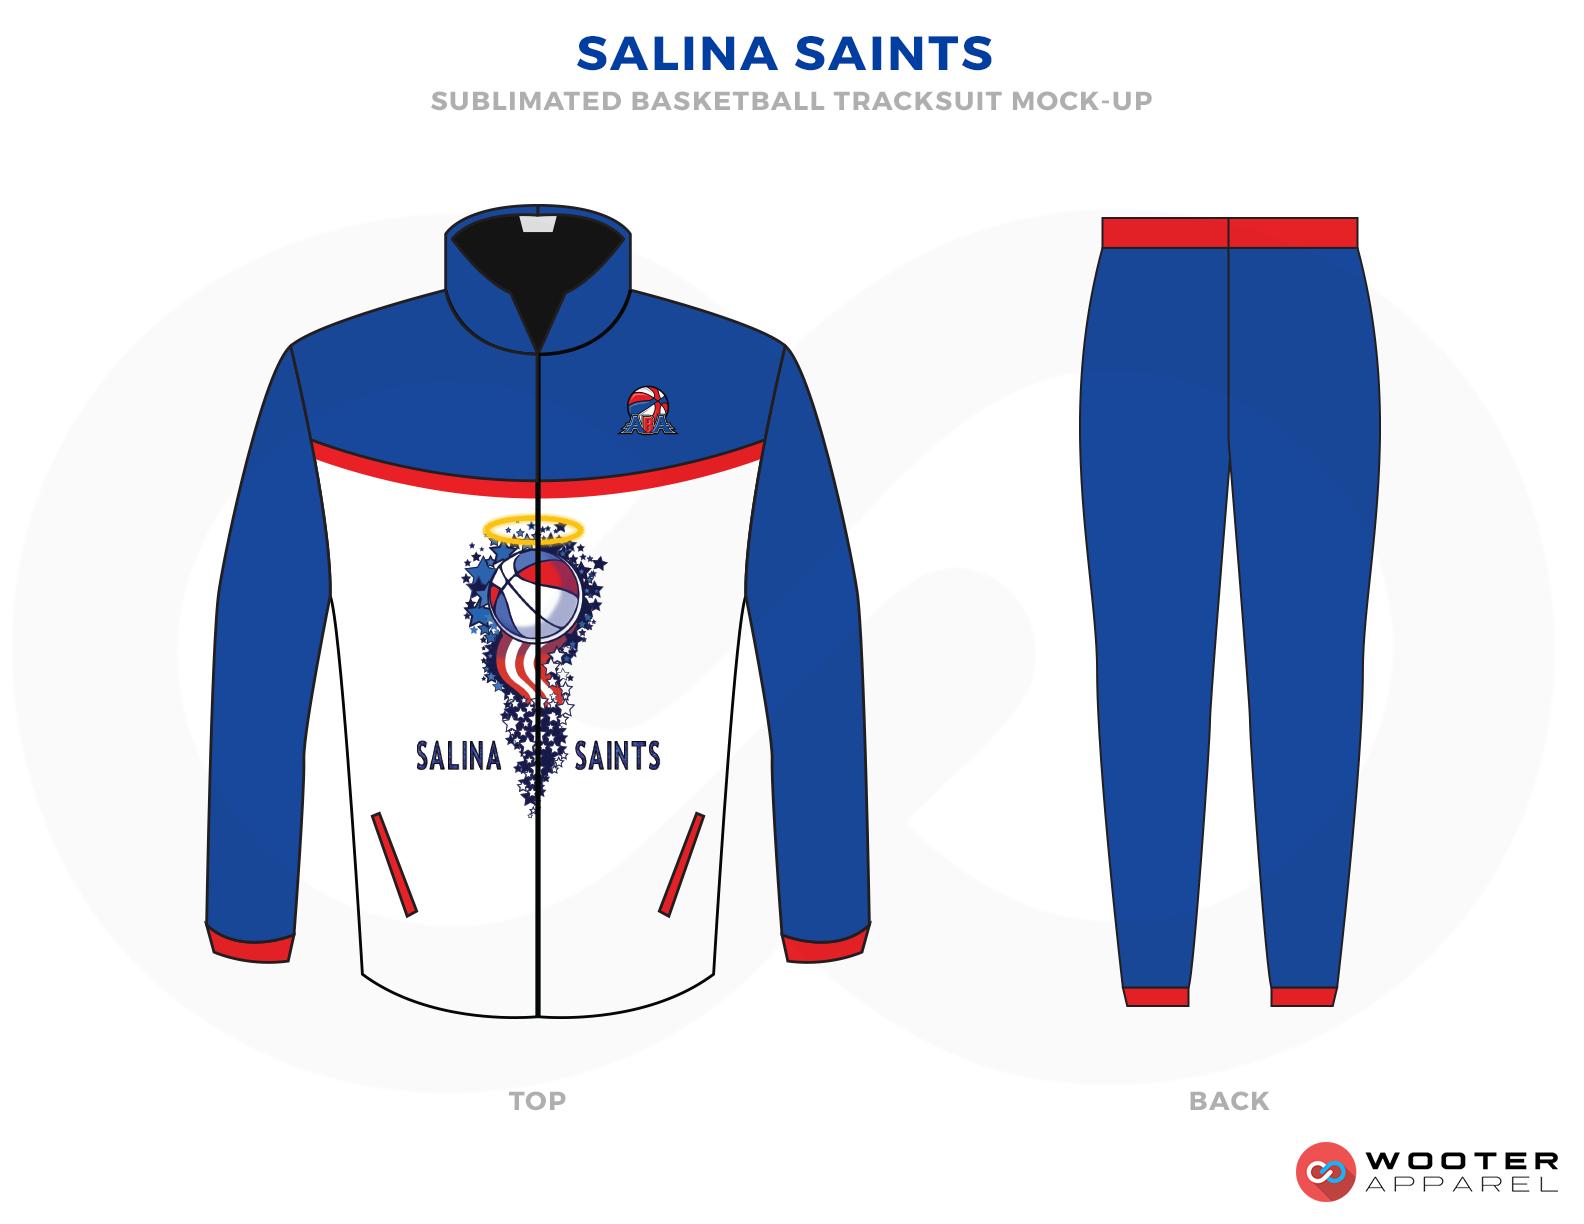 SalinaSaints-BasketballTracksuit-Mockup.png